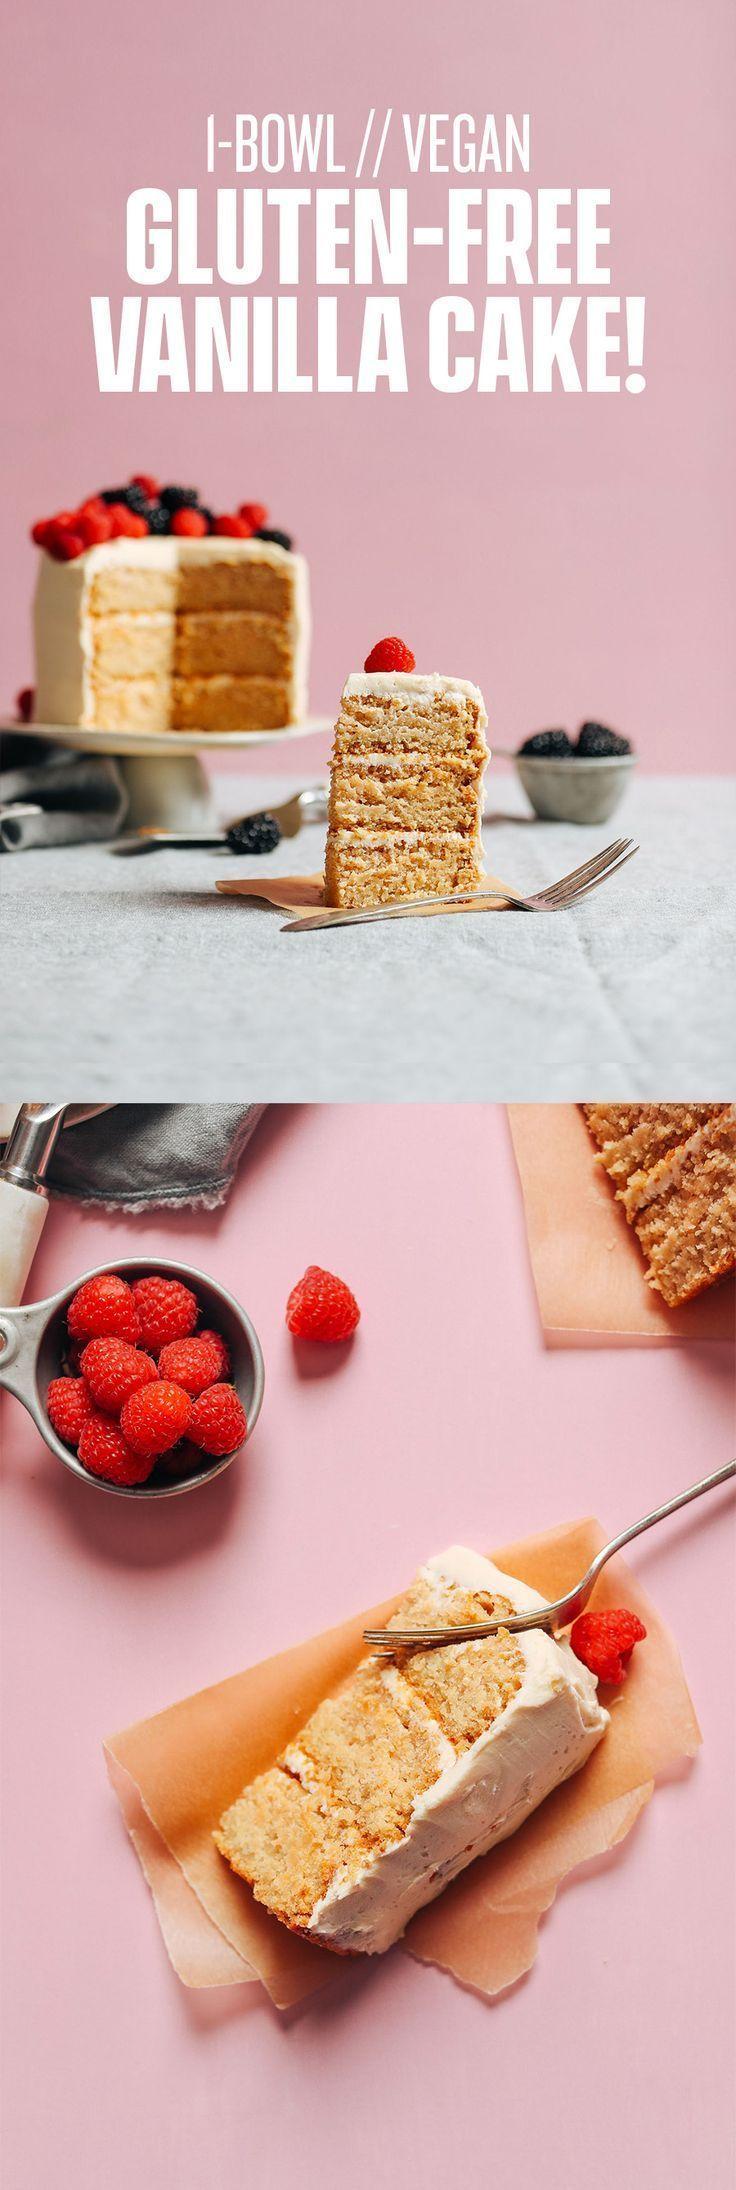 1Bowl Vegan GlutenFree Vanilla Cake Recipe Gluten